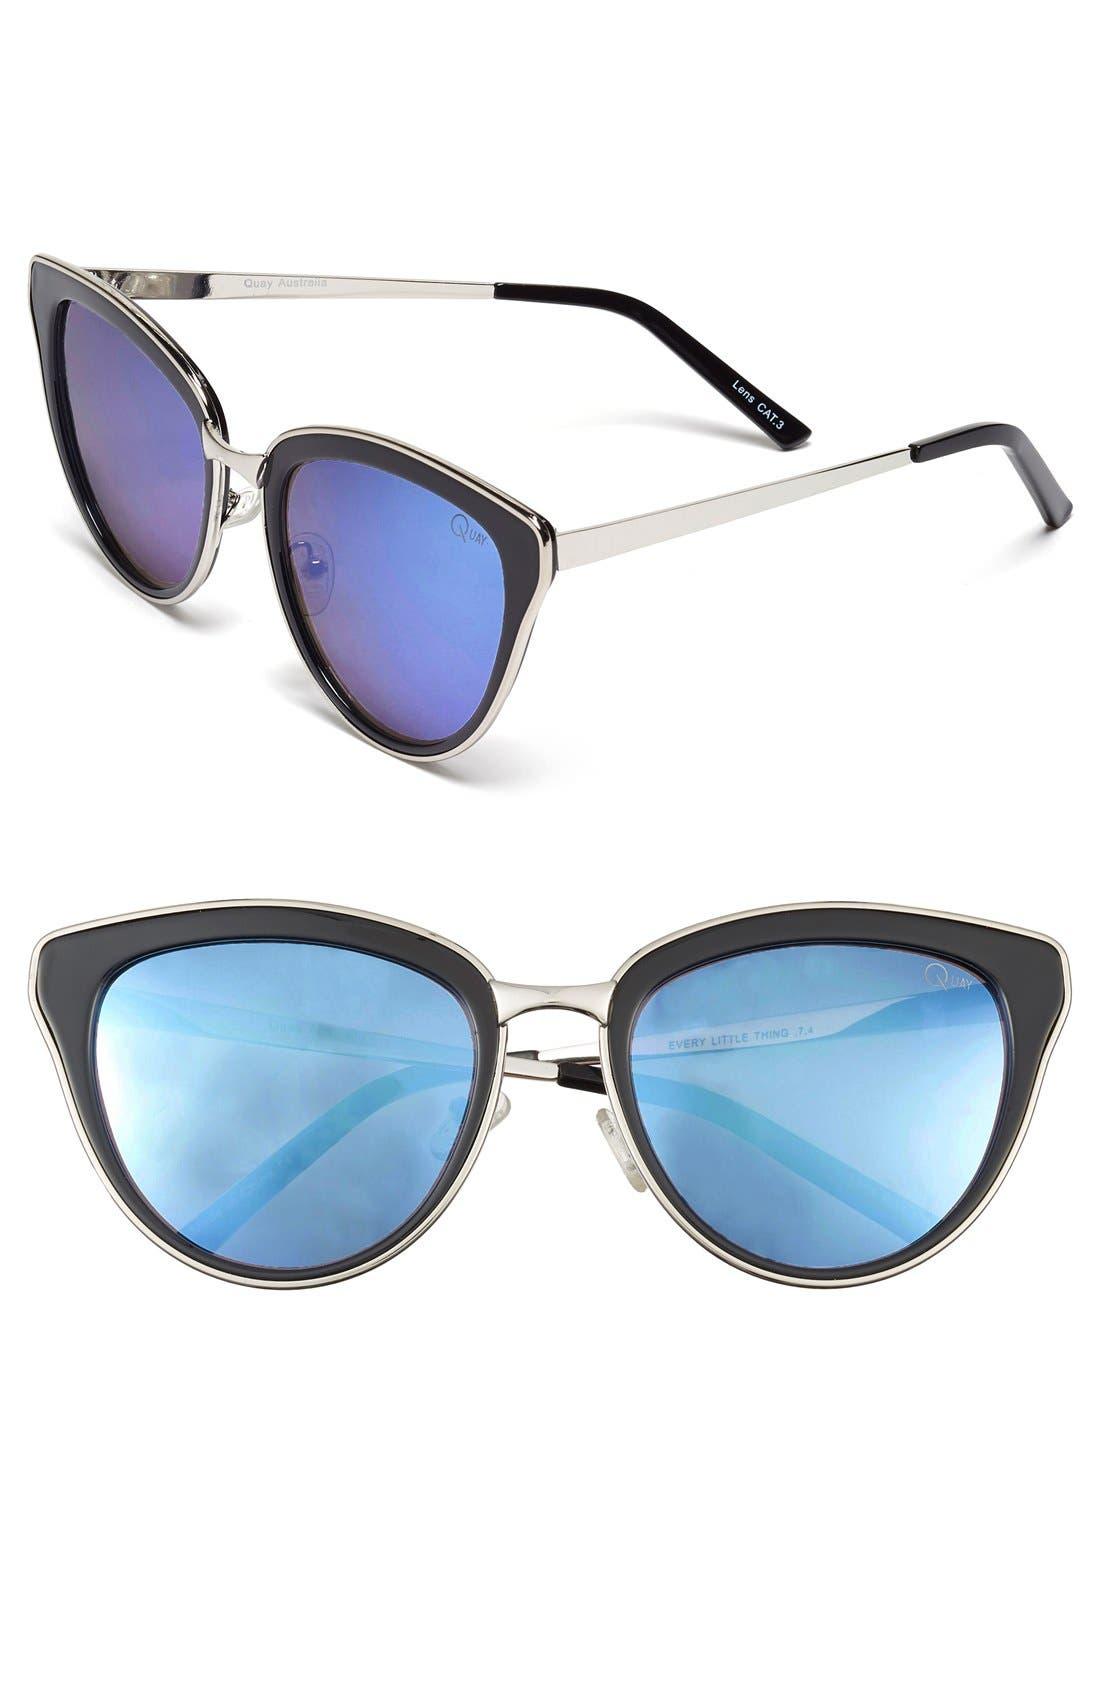 Main Image - Quay Australia 'Every Little Thing' 54mm Cat Eye Sunglasses